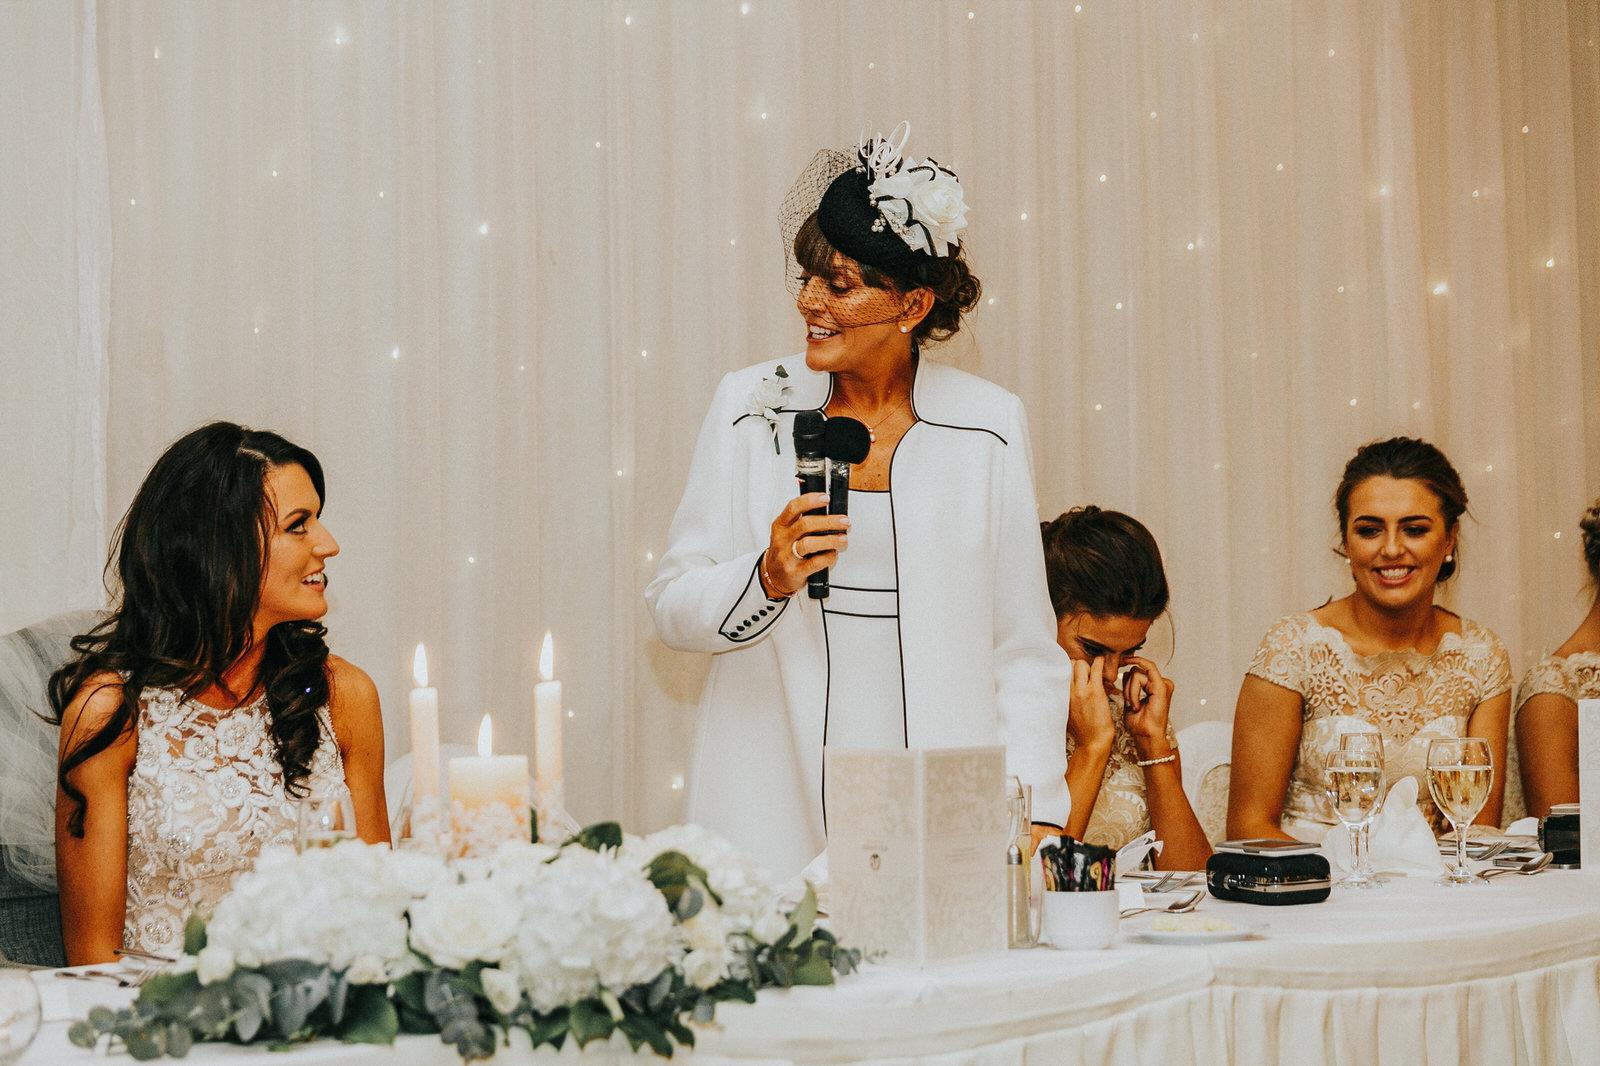 Roger_Kenny_wedding_photographer_505.jpg